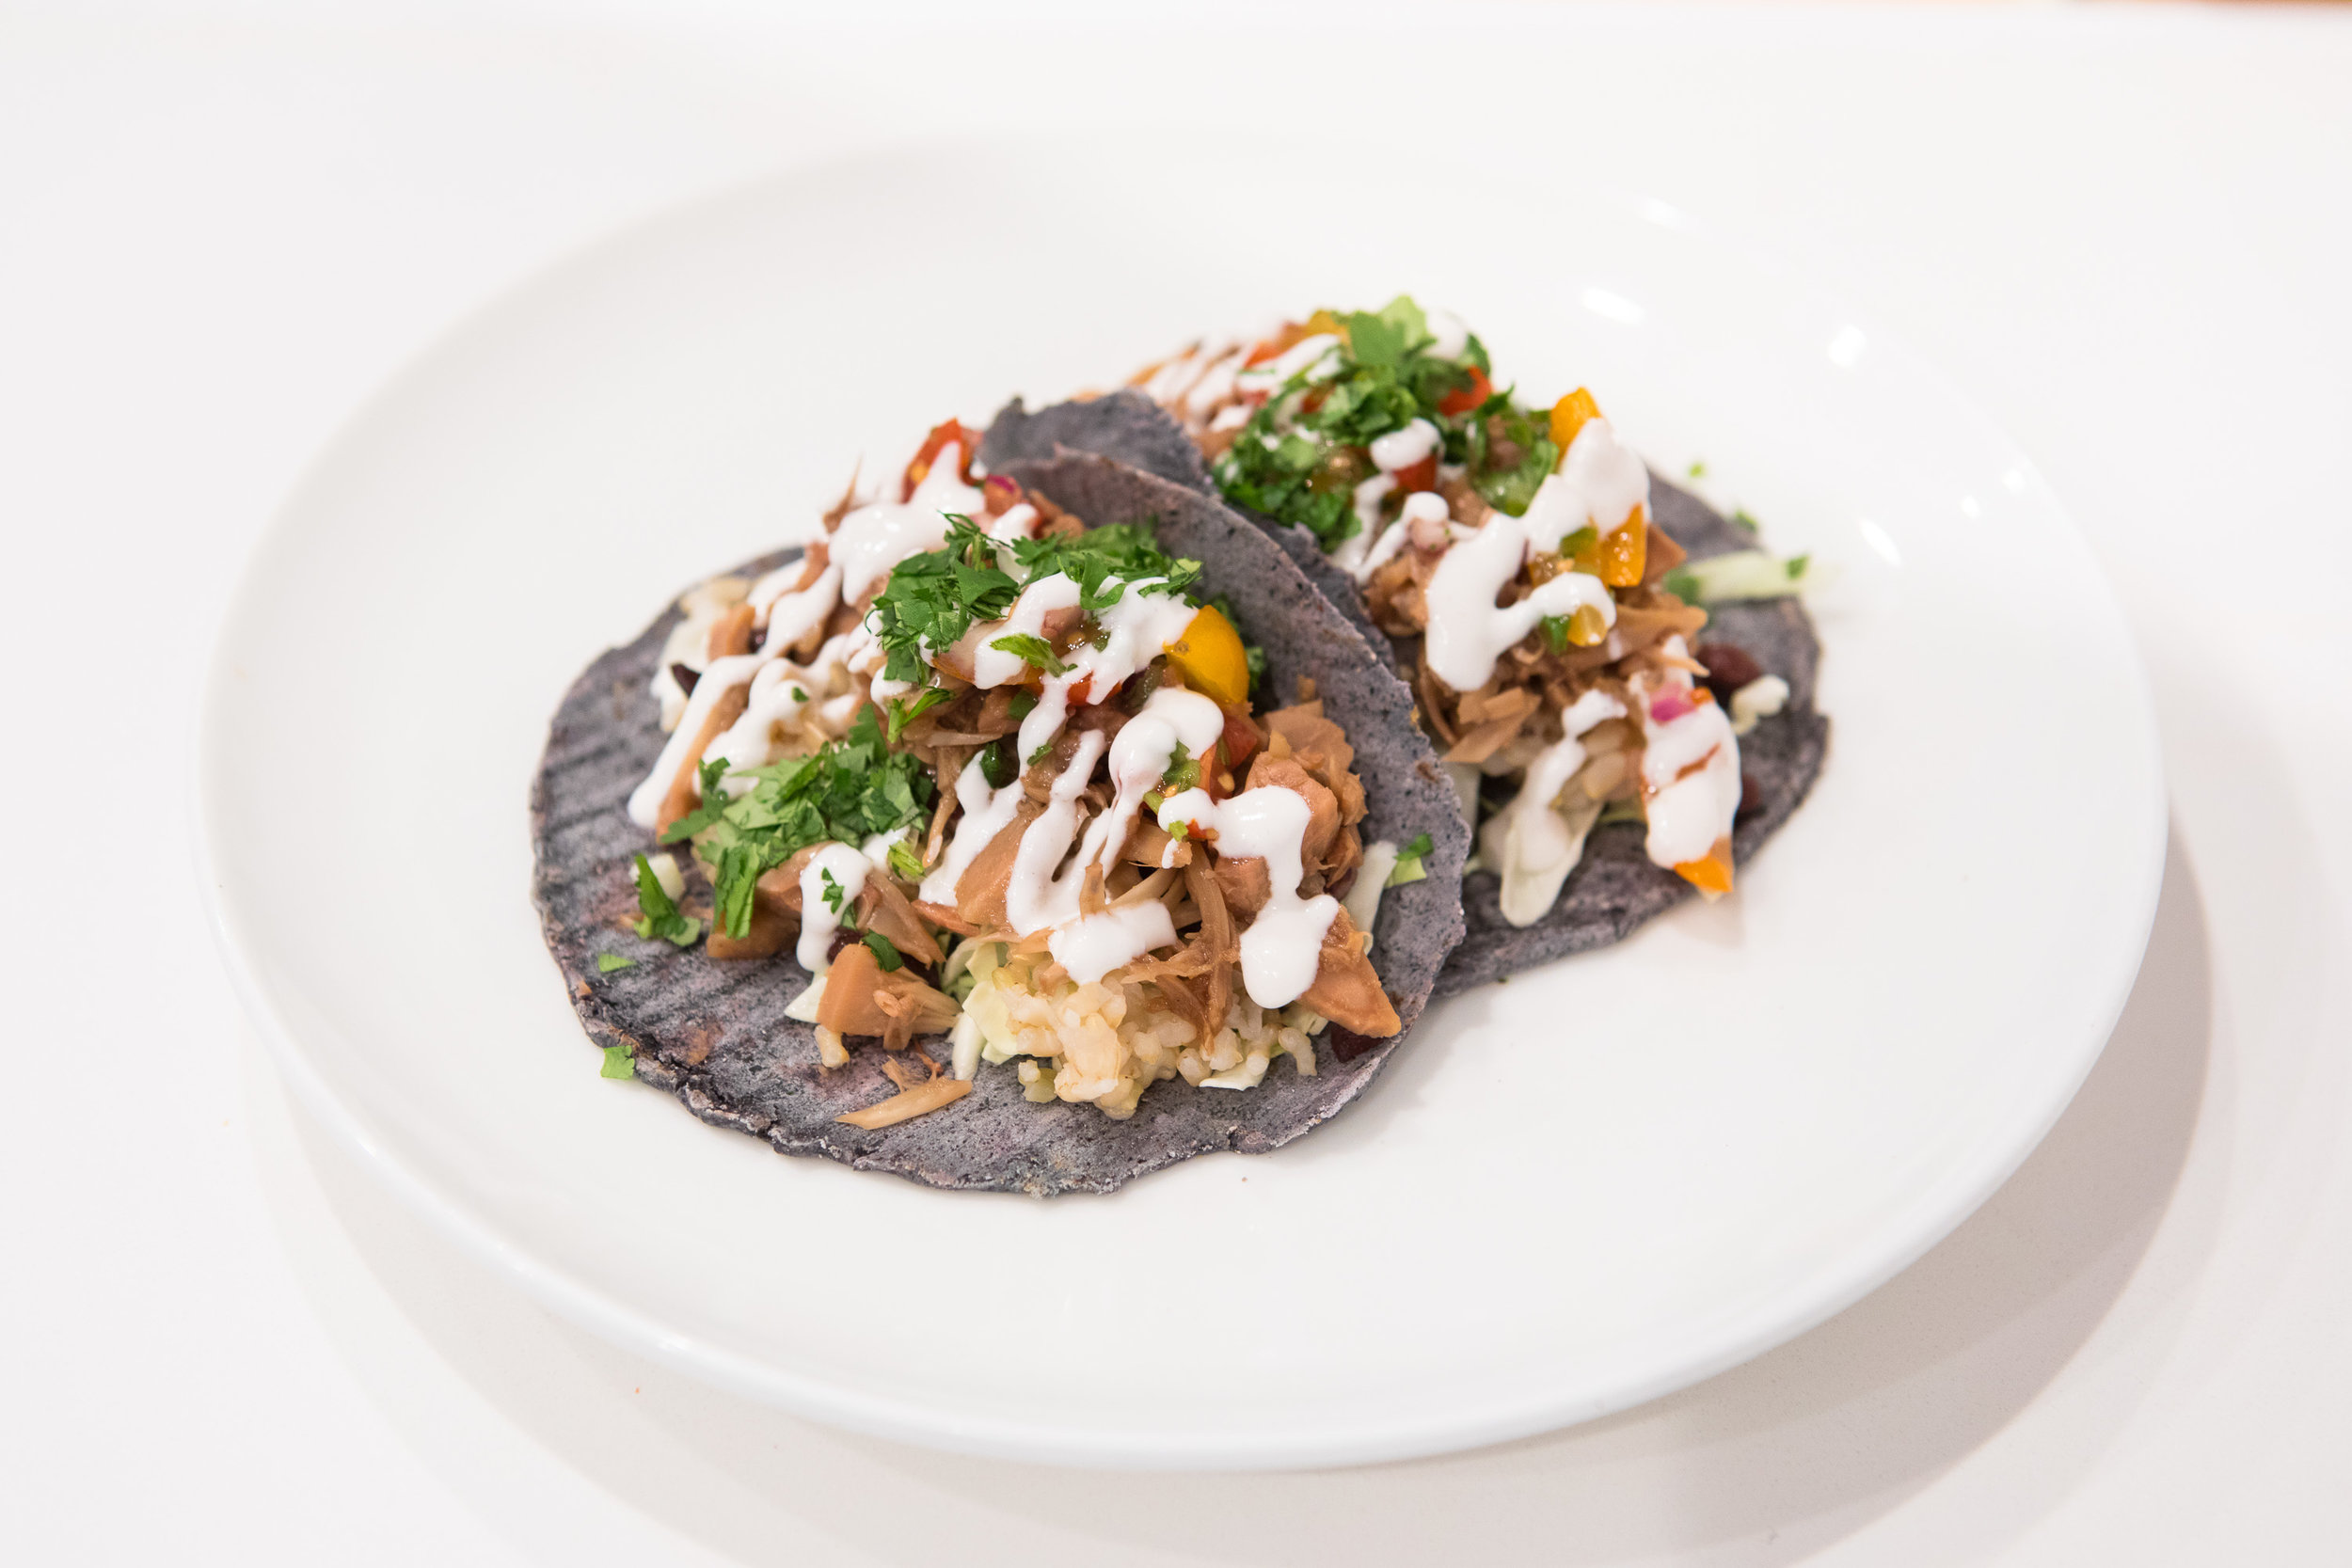 tacos-Maka-vegan-gluten-free-cafe-maui-1.jpg